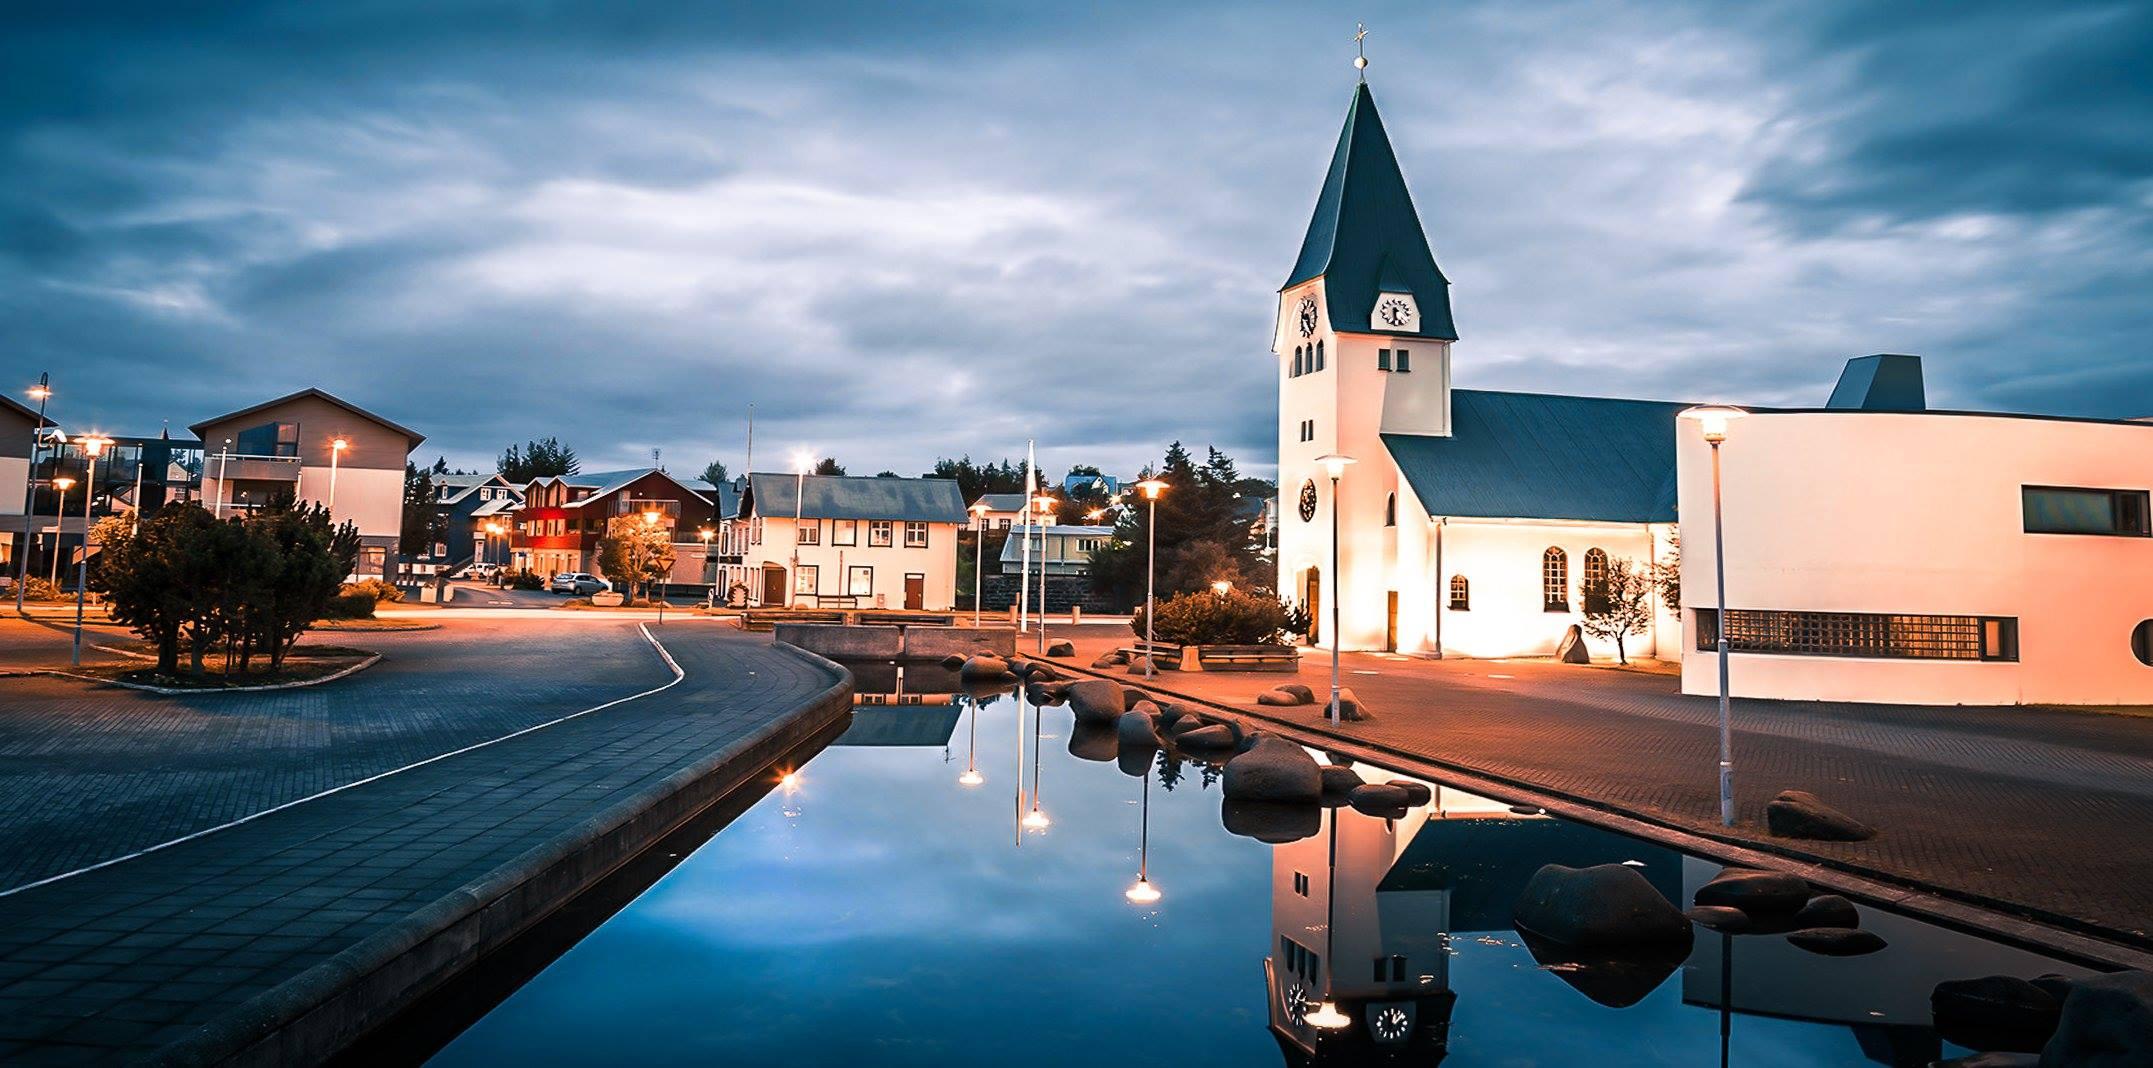 Reykjavik by Rohit Das